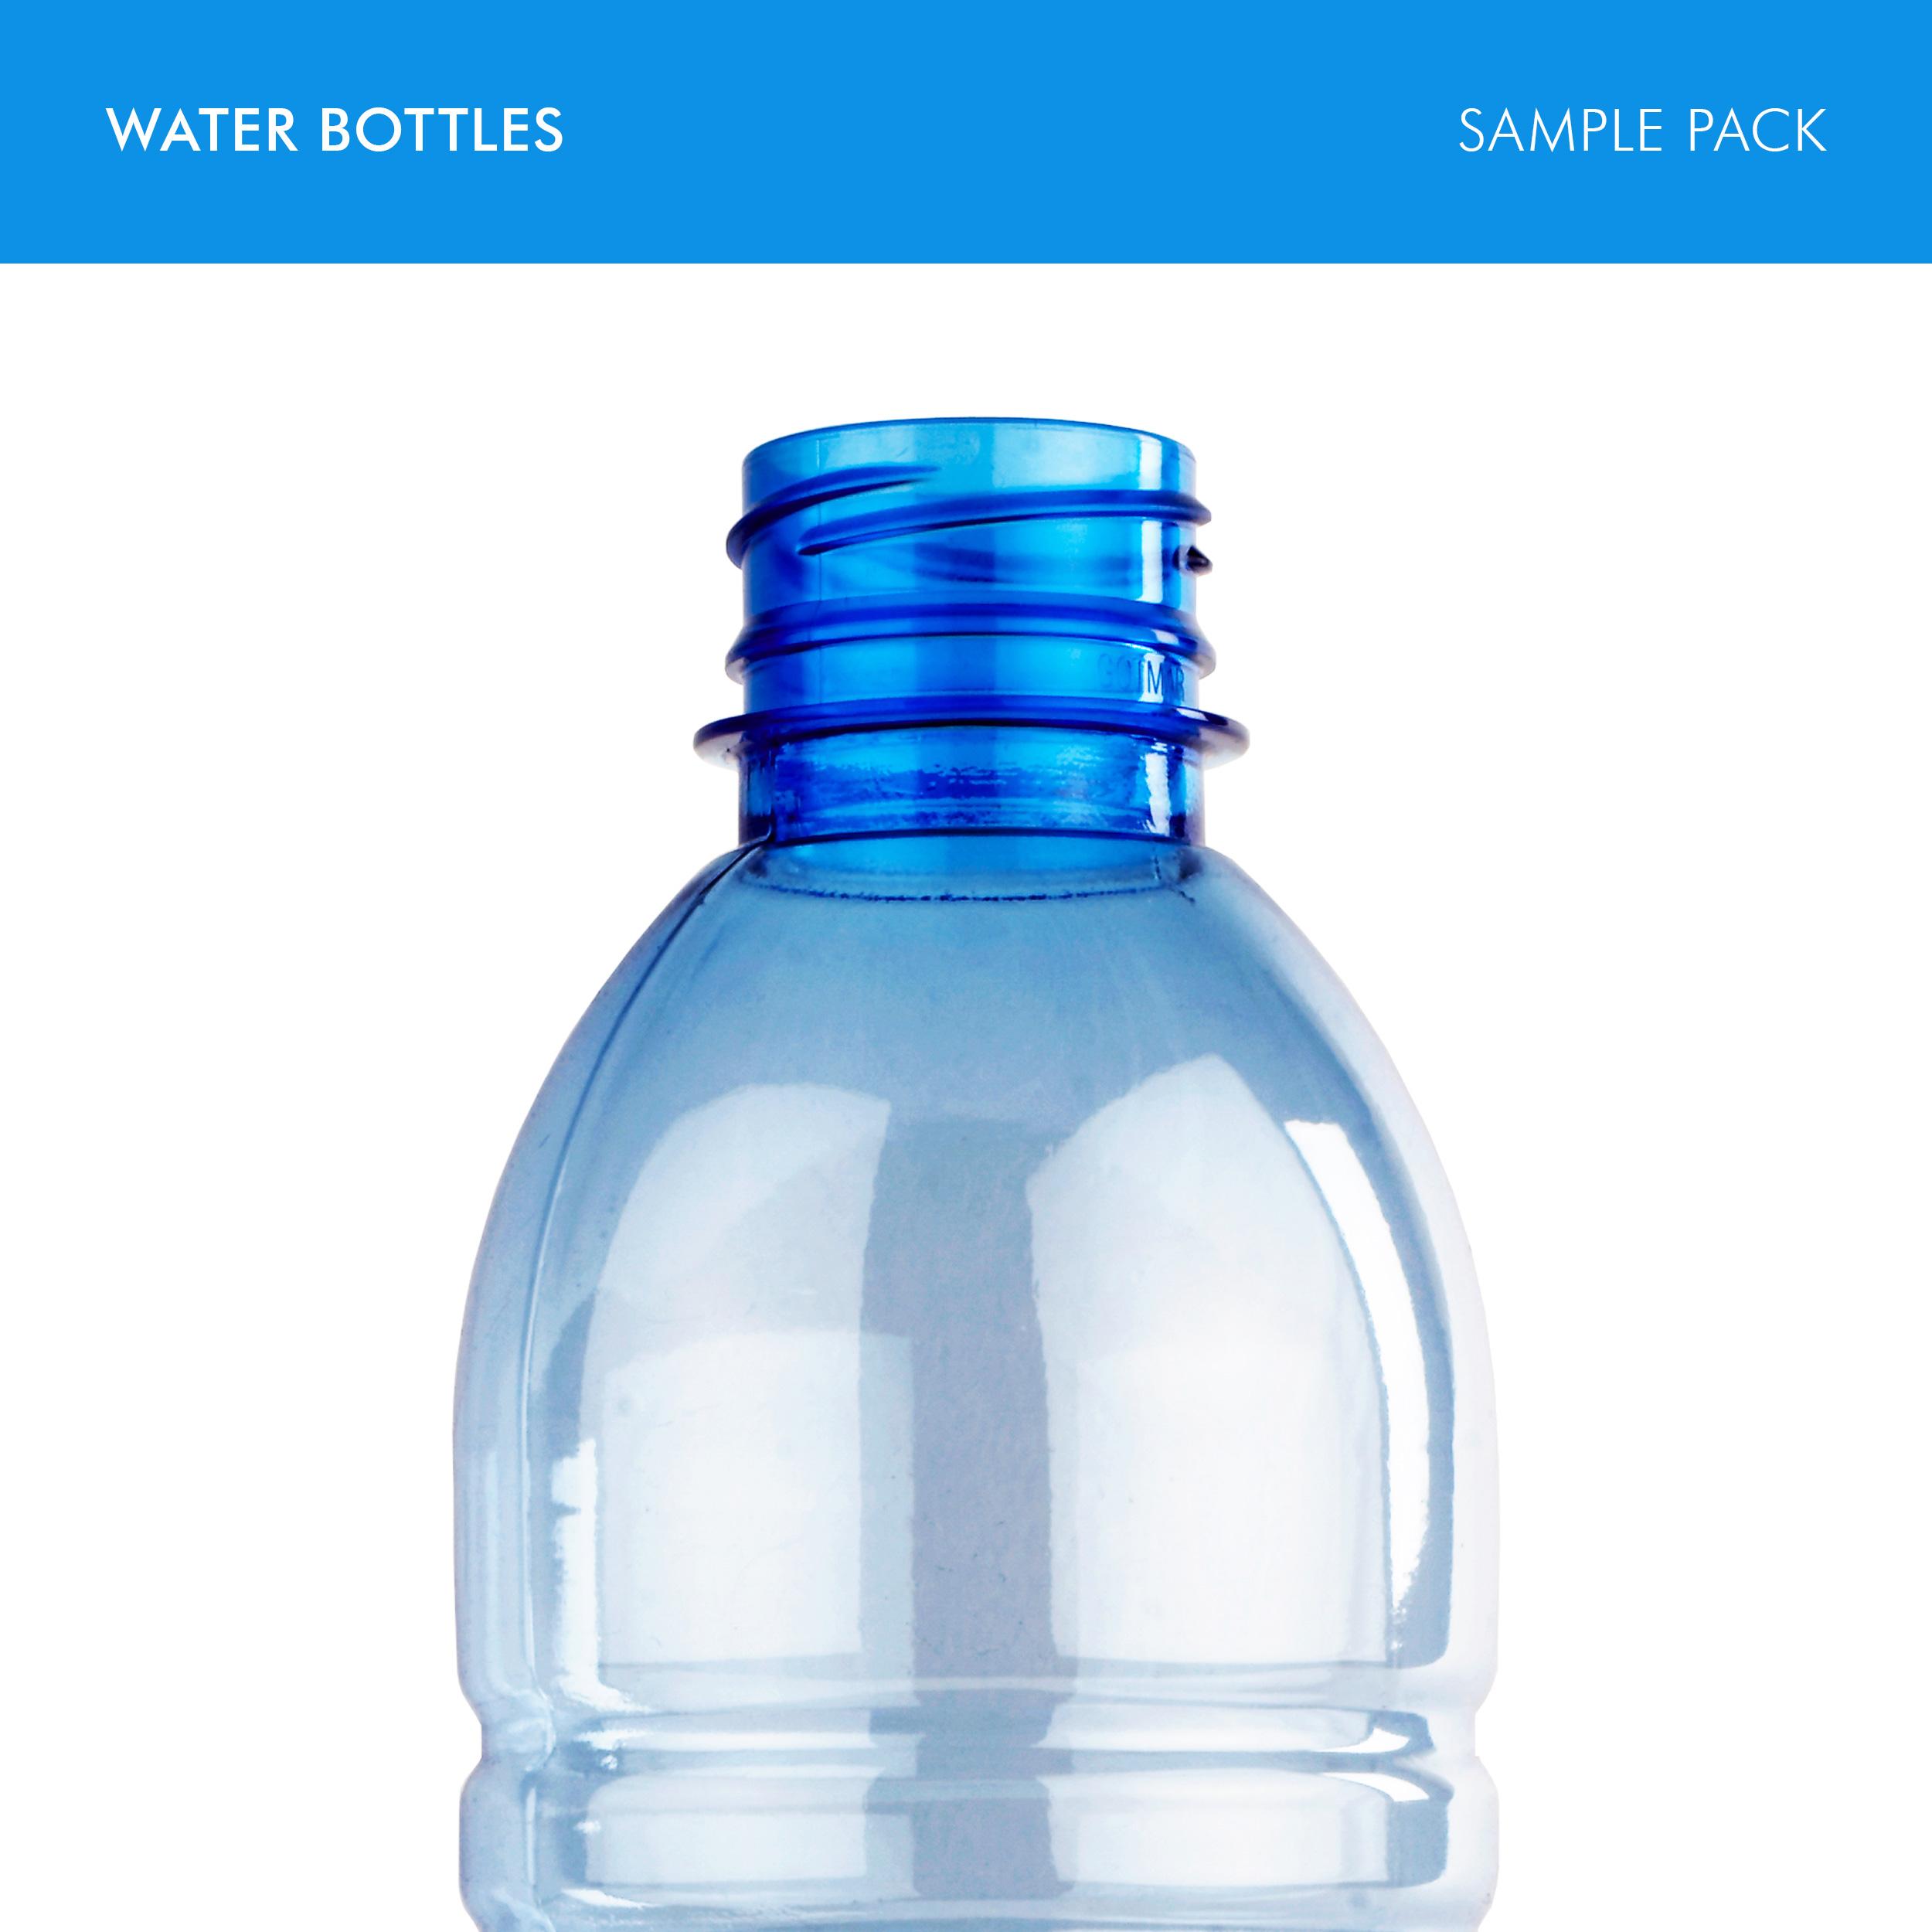 WATER BOTTLES SAMPLE PACK — ANDREW HUANG